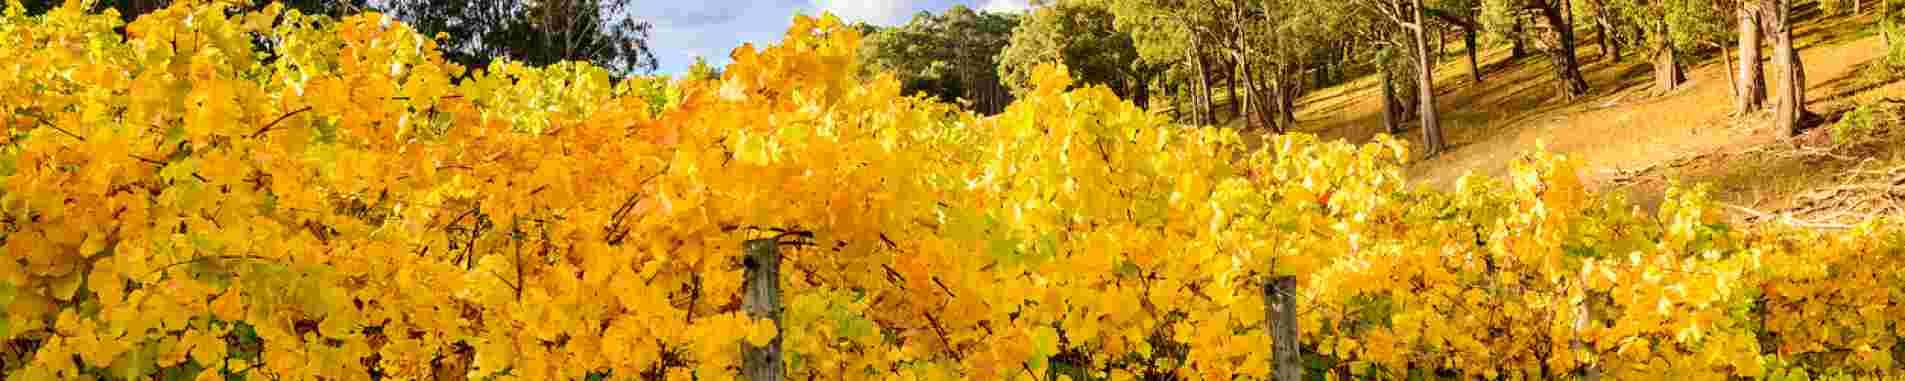 Adelaide / Wine Regions header image